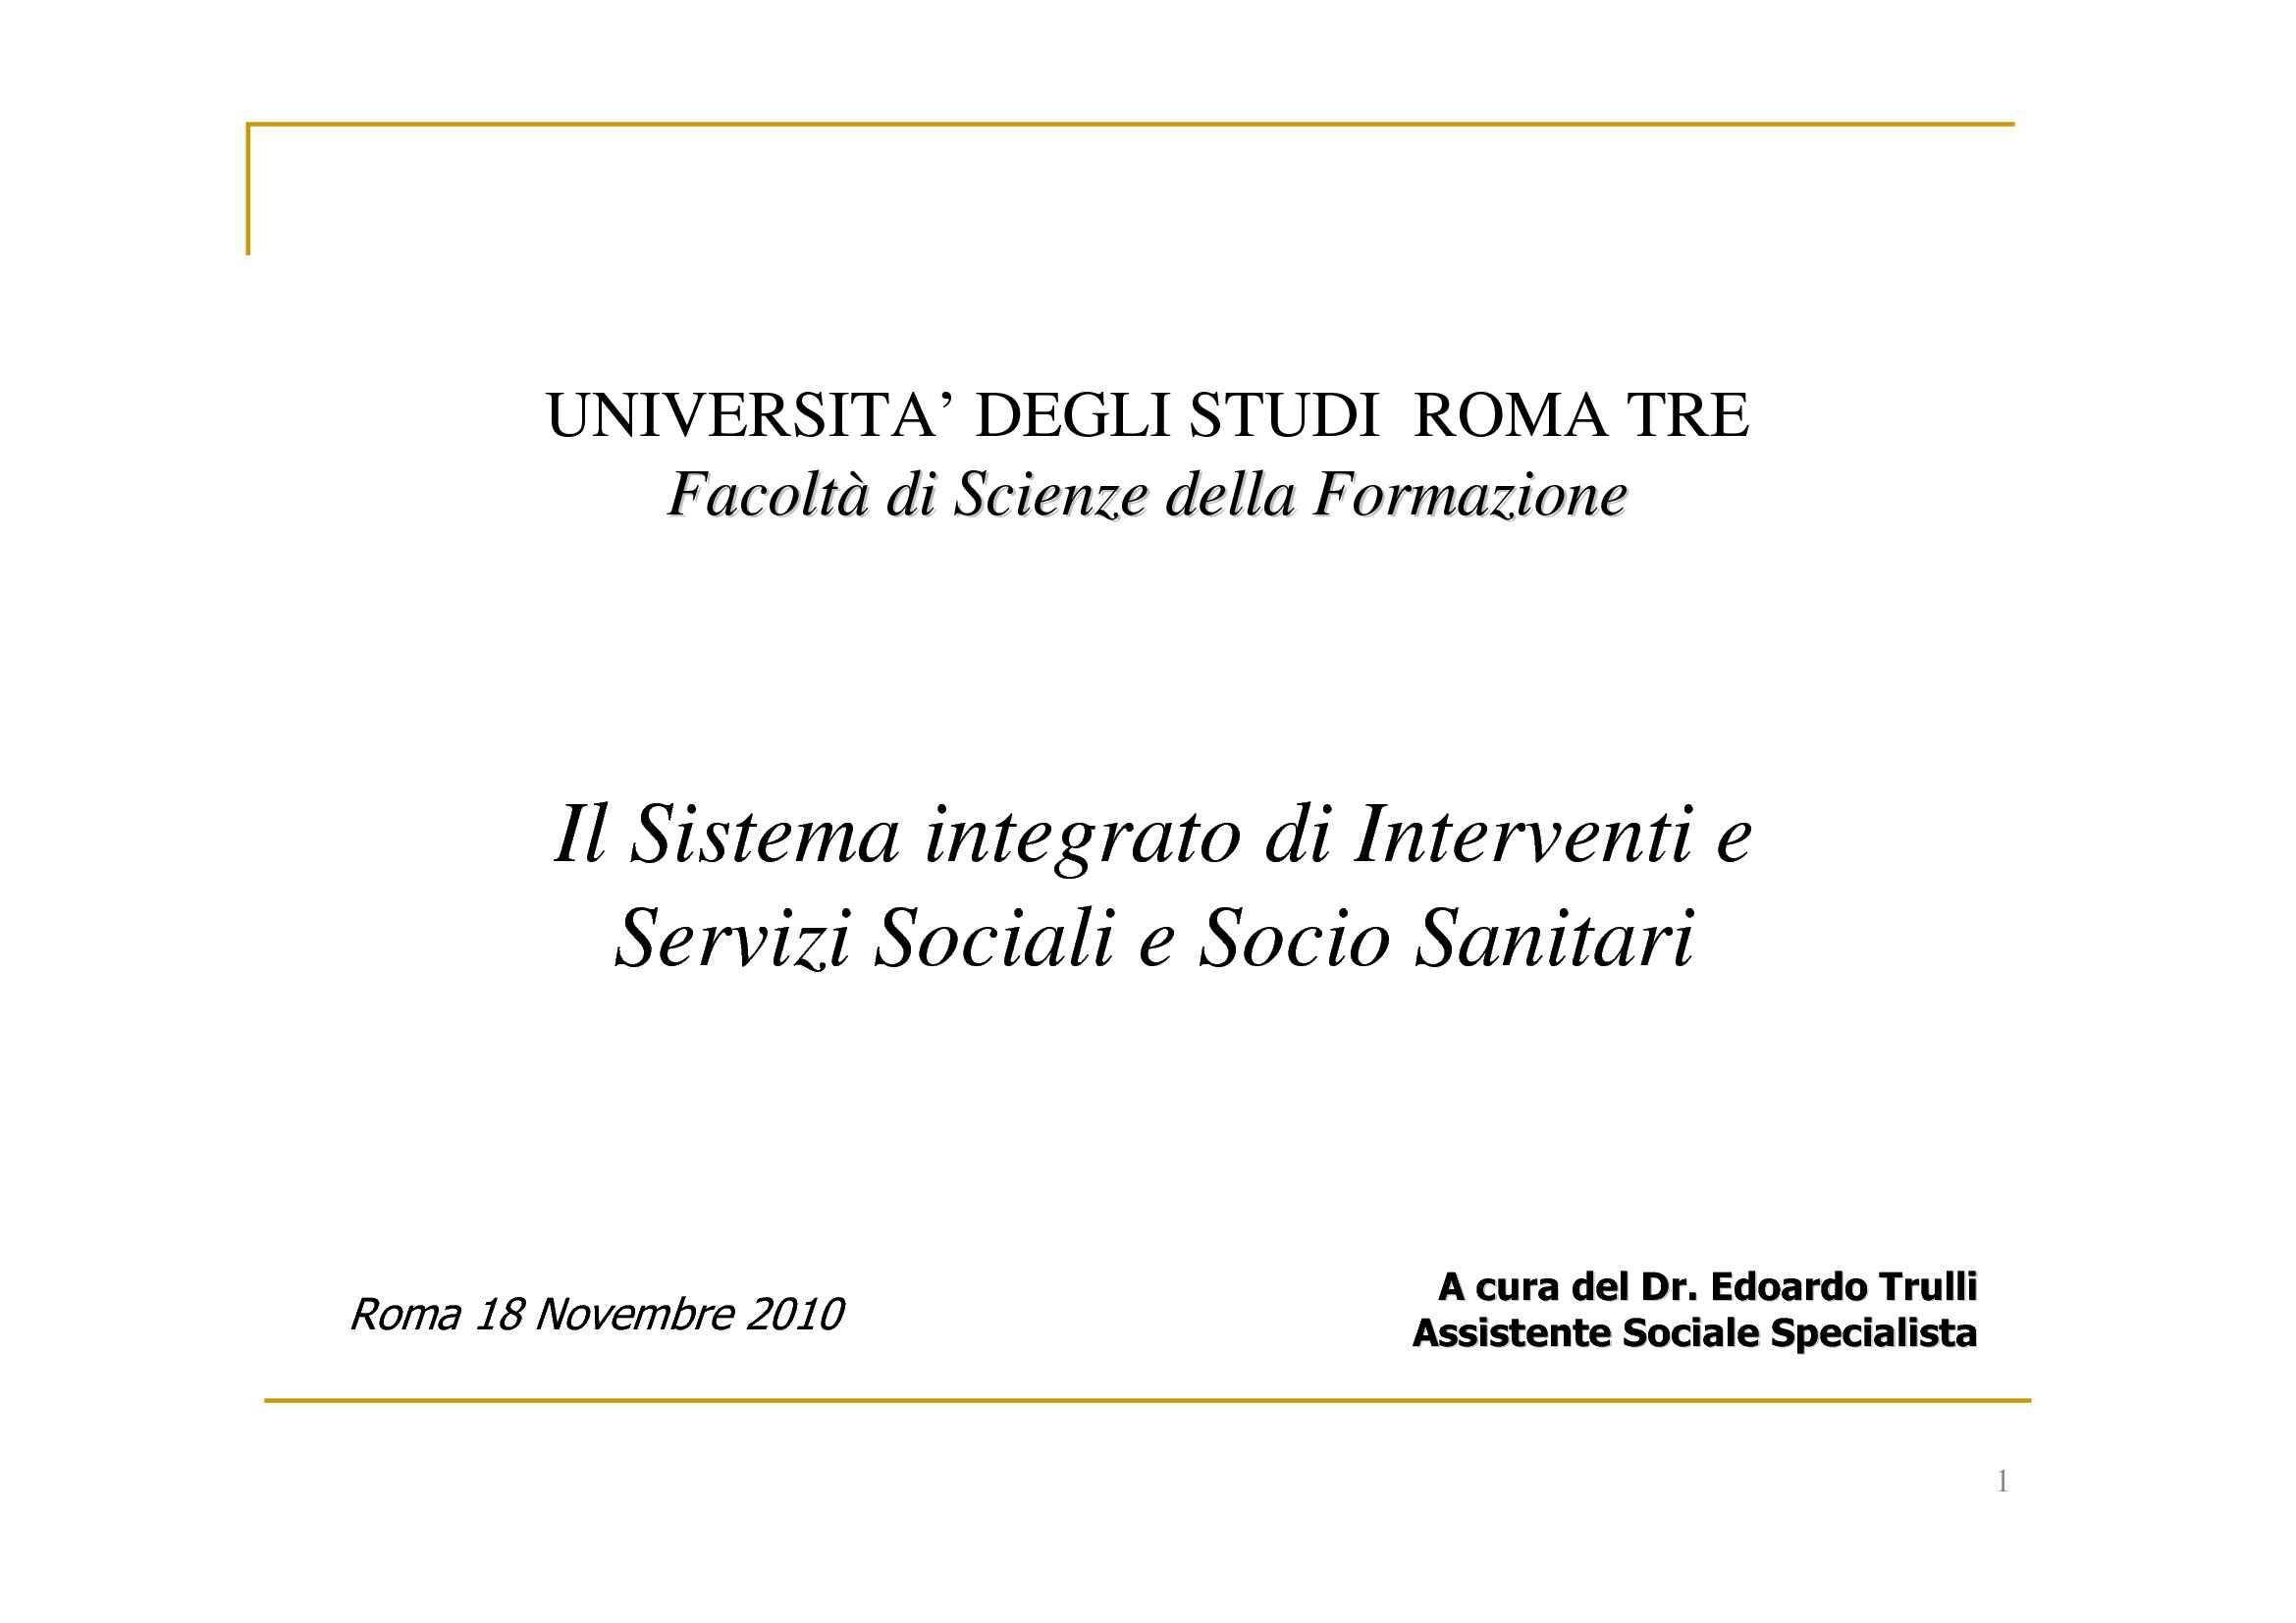 Servizi Sociali - Sistema integrato